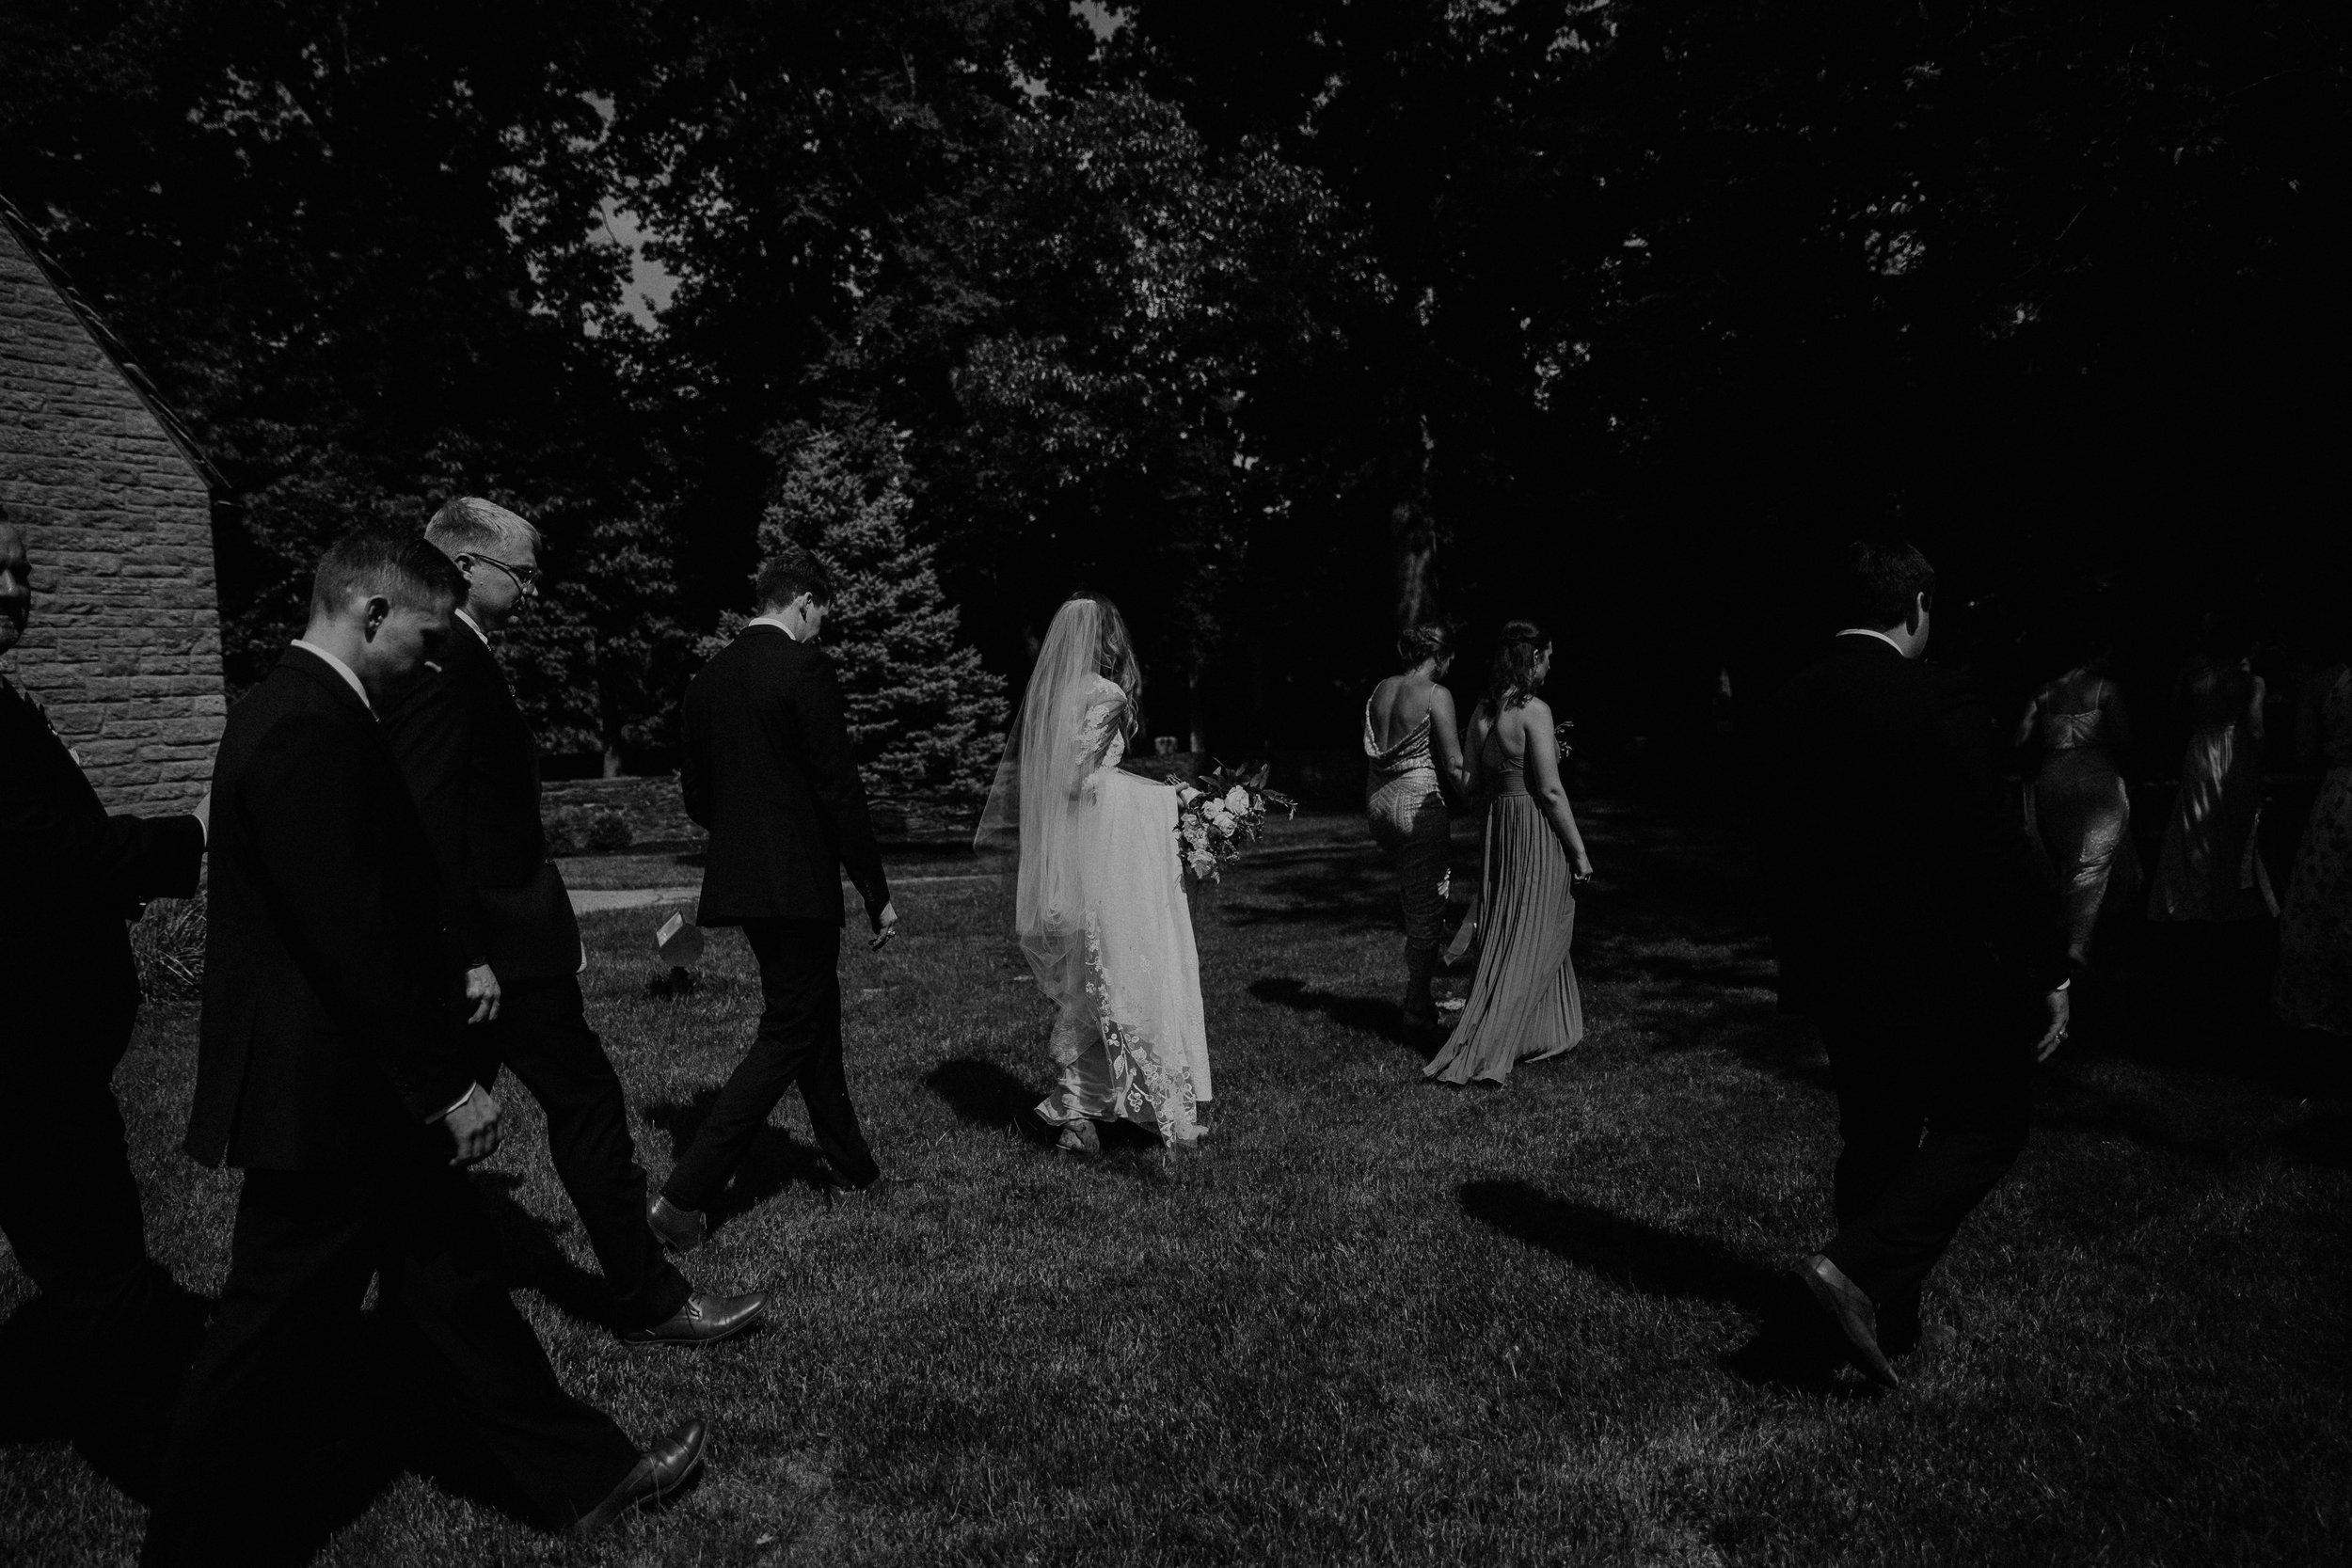 Mariemont_Chapel_Cincinnati_Wedding_Hannah_Nick-EDIT-406.JPG